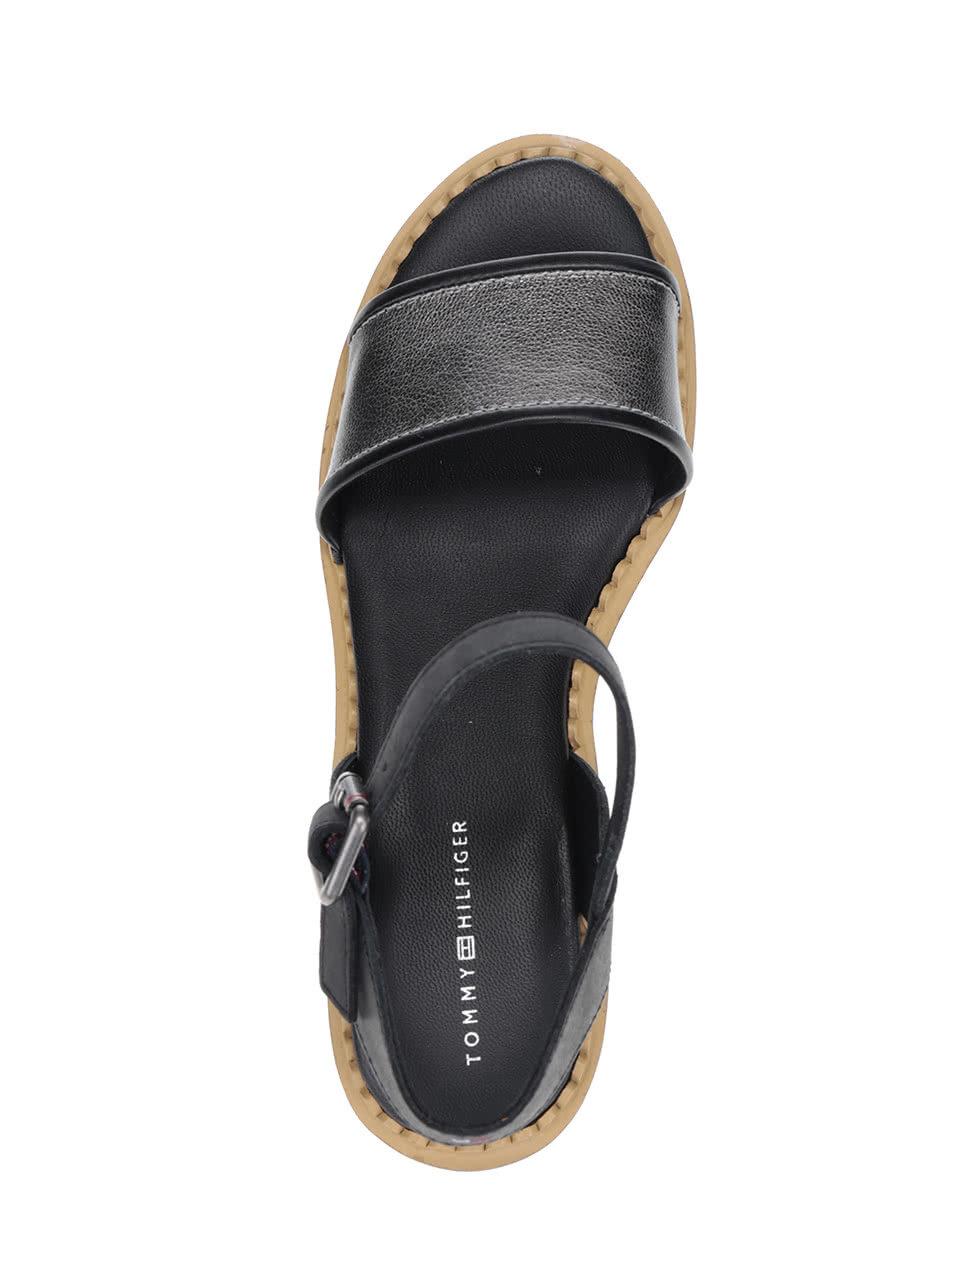 2f2a7a4aedef Krémovo-čierne dámske sandále na platforme Tommy Hilfiger ...